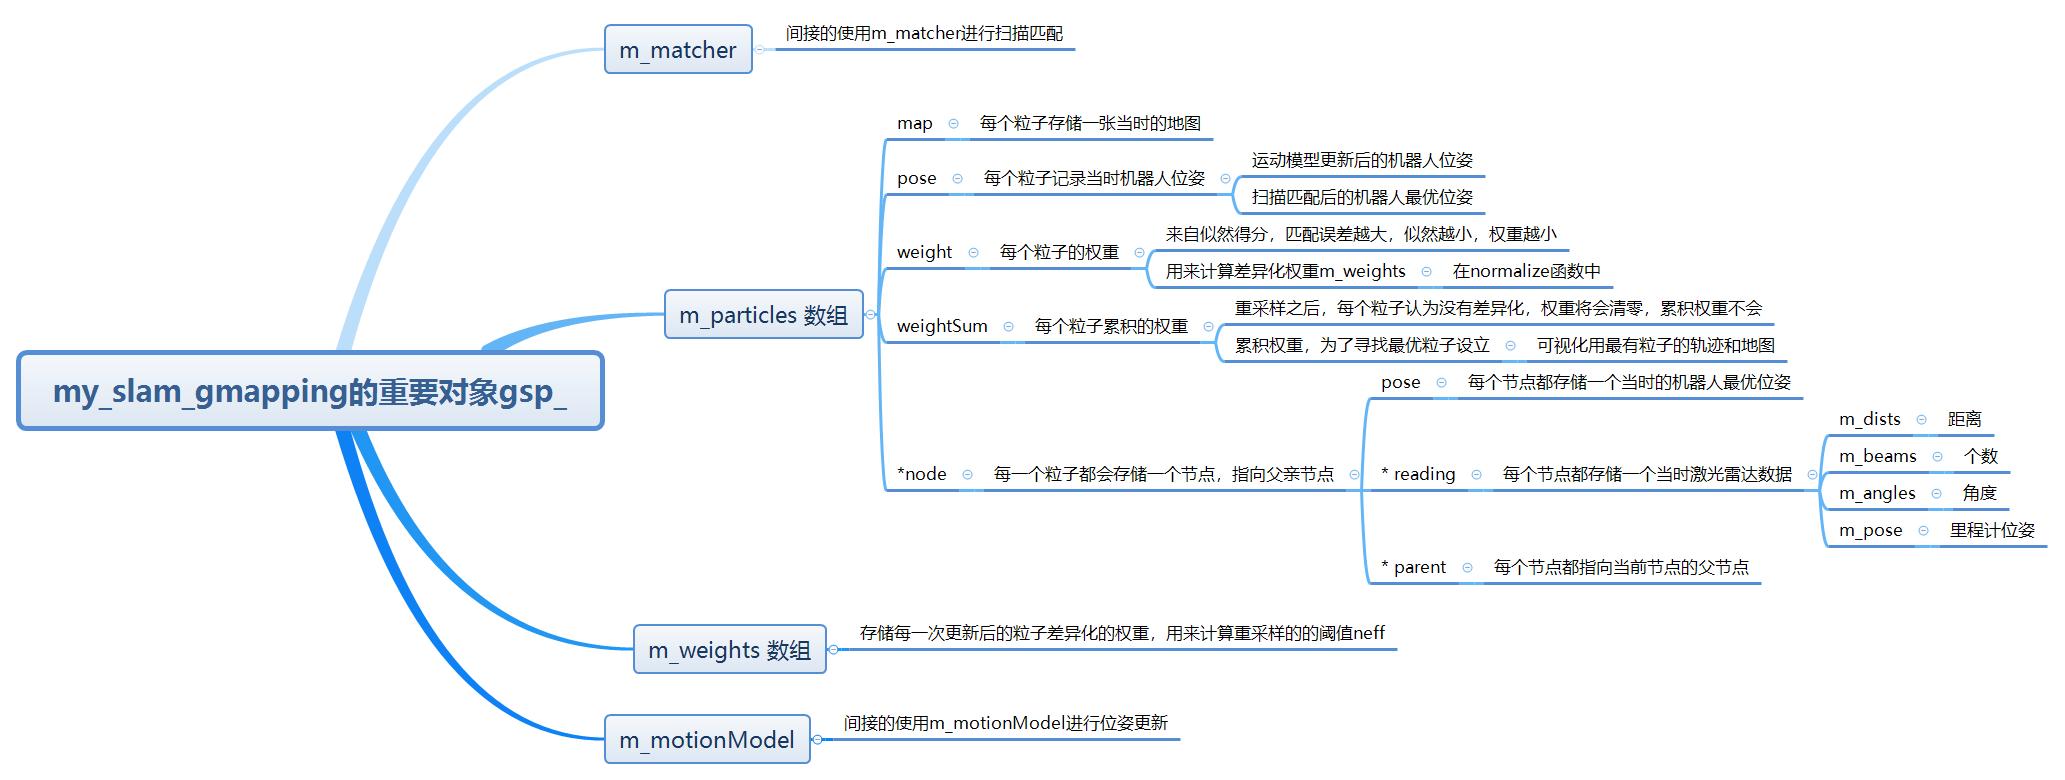 my_slam_gmapping的重要对象gsp_